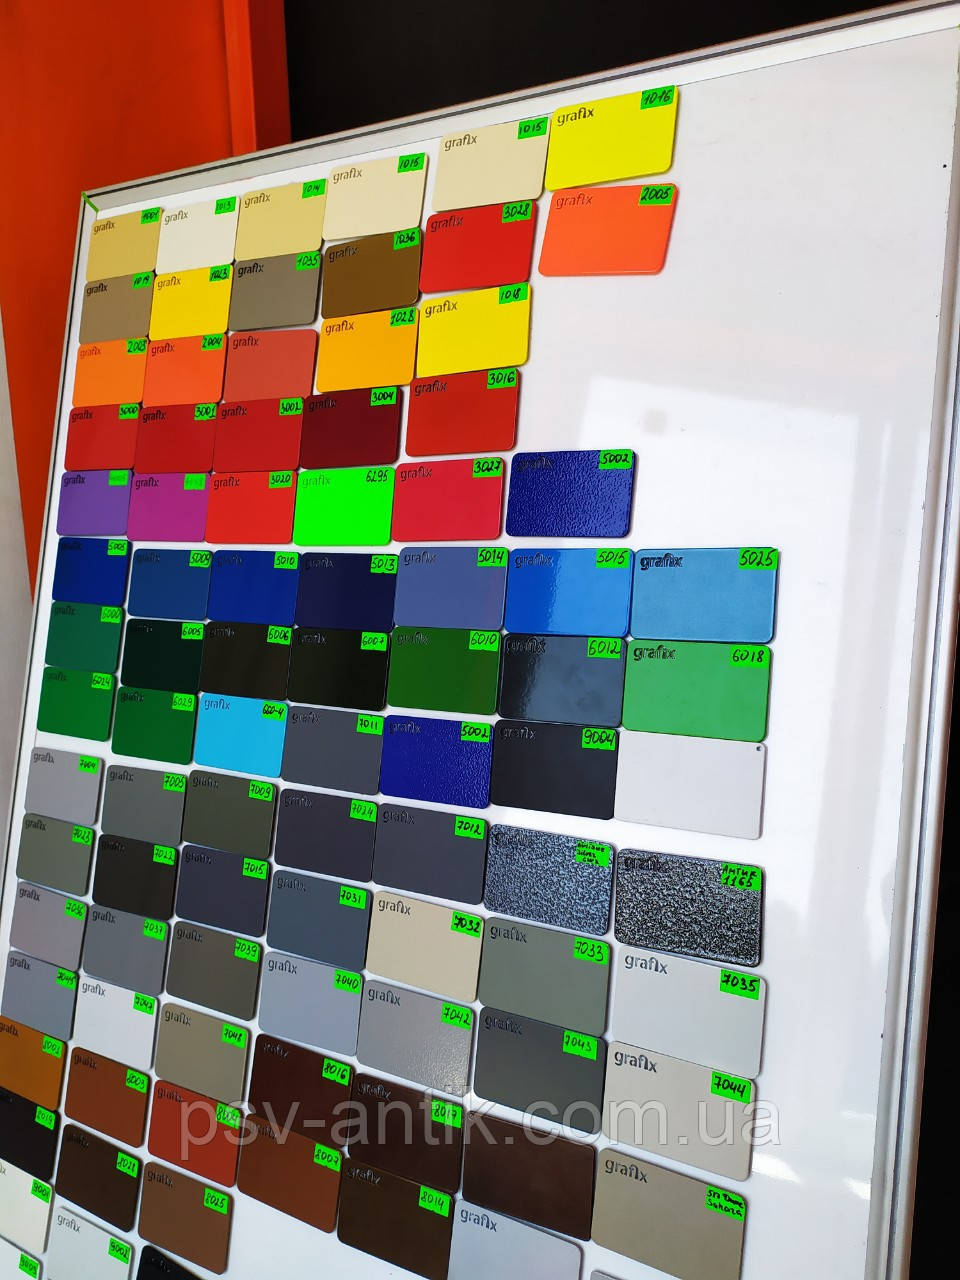 Порошковая краска глянцевая, полиэфирная, архитектурная, 6020